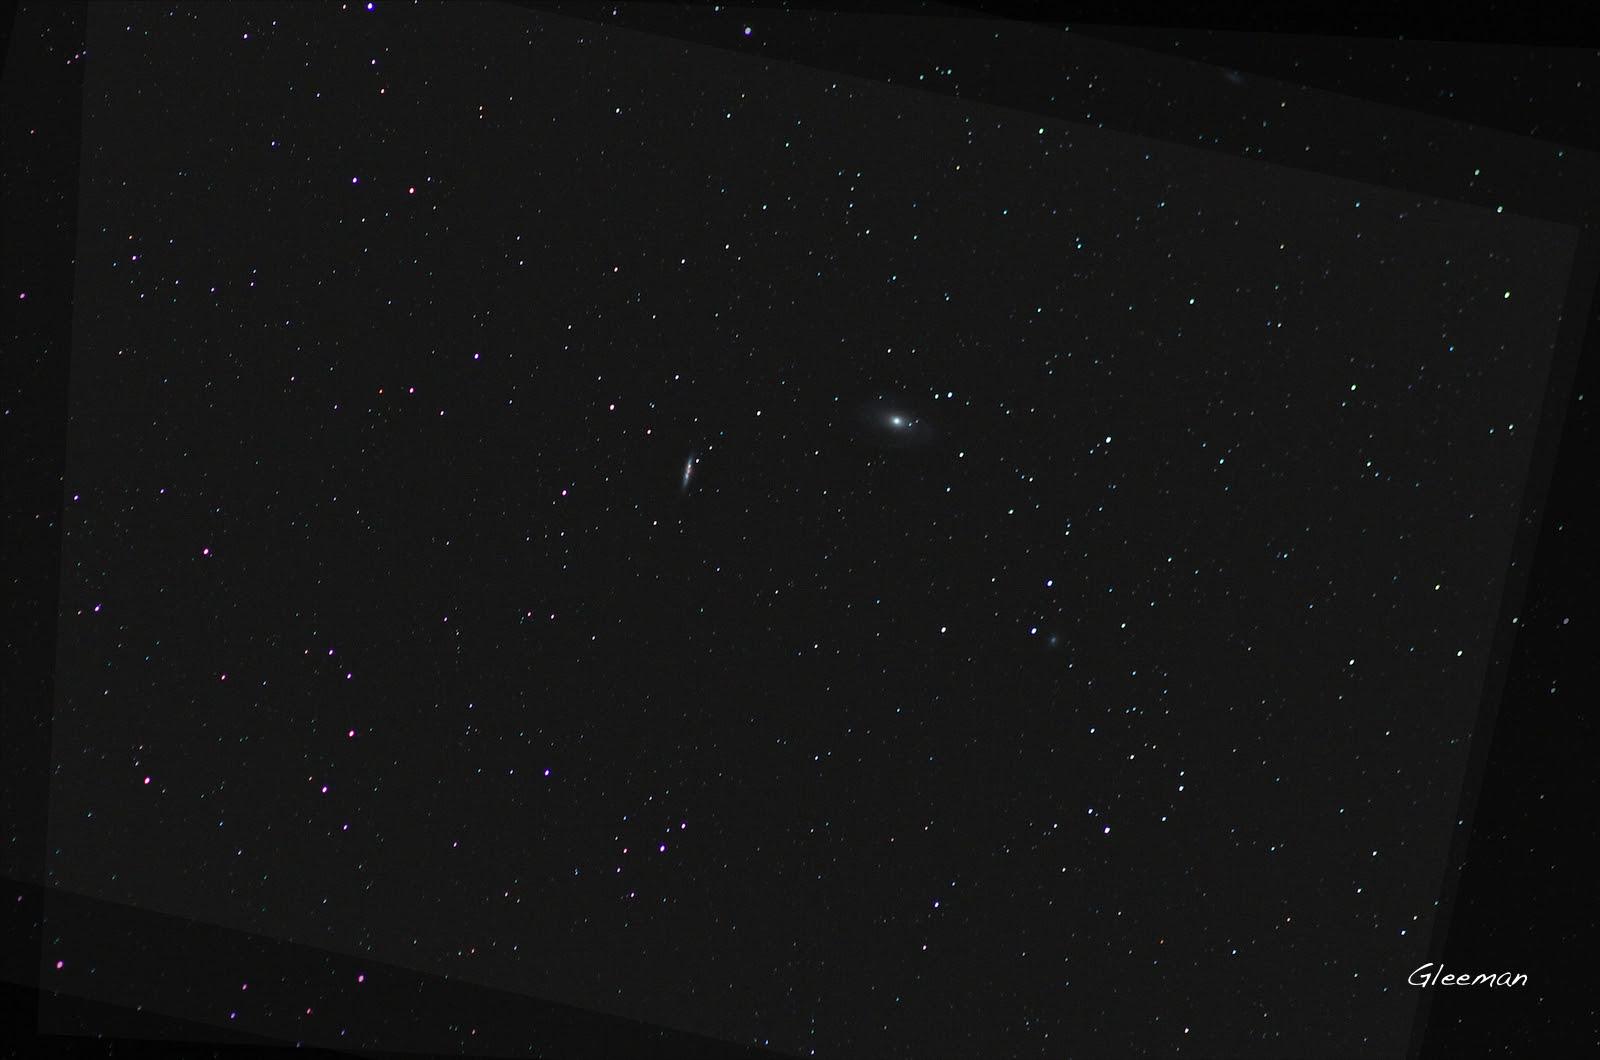 Supernova (SN 2014J) in M82 Pentax K5 + O-GPS1 + Tamron Adaptall-2 SP 300mm f/2.8 LD IF (60B) LPS-P2 filter